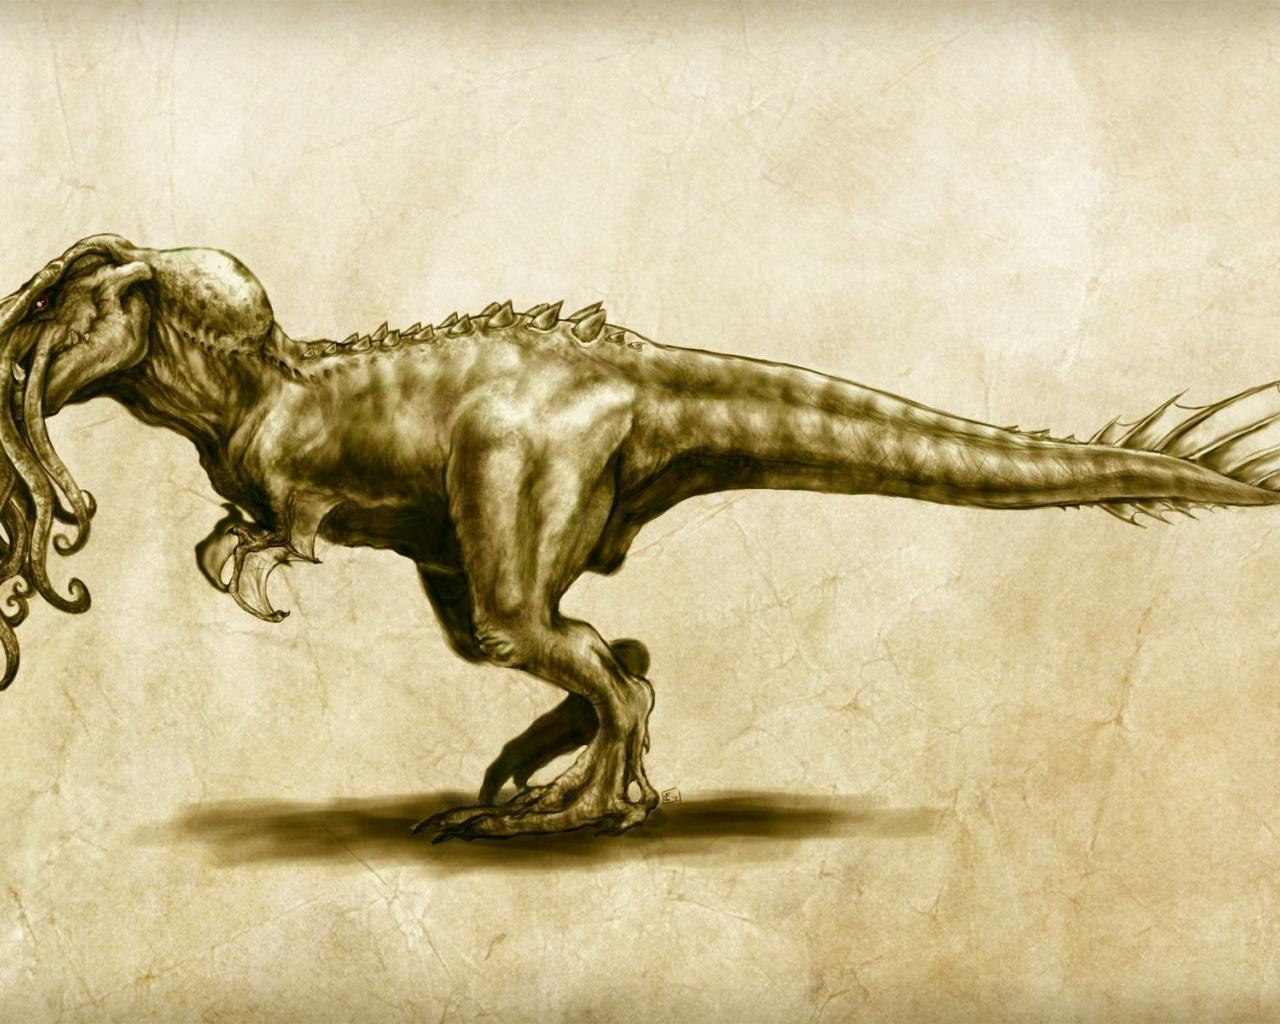 Funny dinosaur wallpaper 1900x1200 HQ WALLPAPER 37402 1280x1024